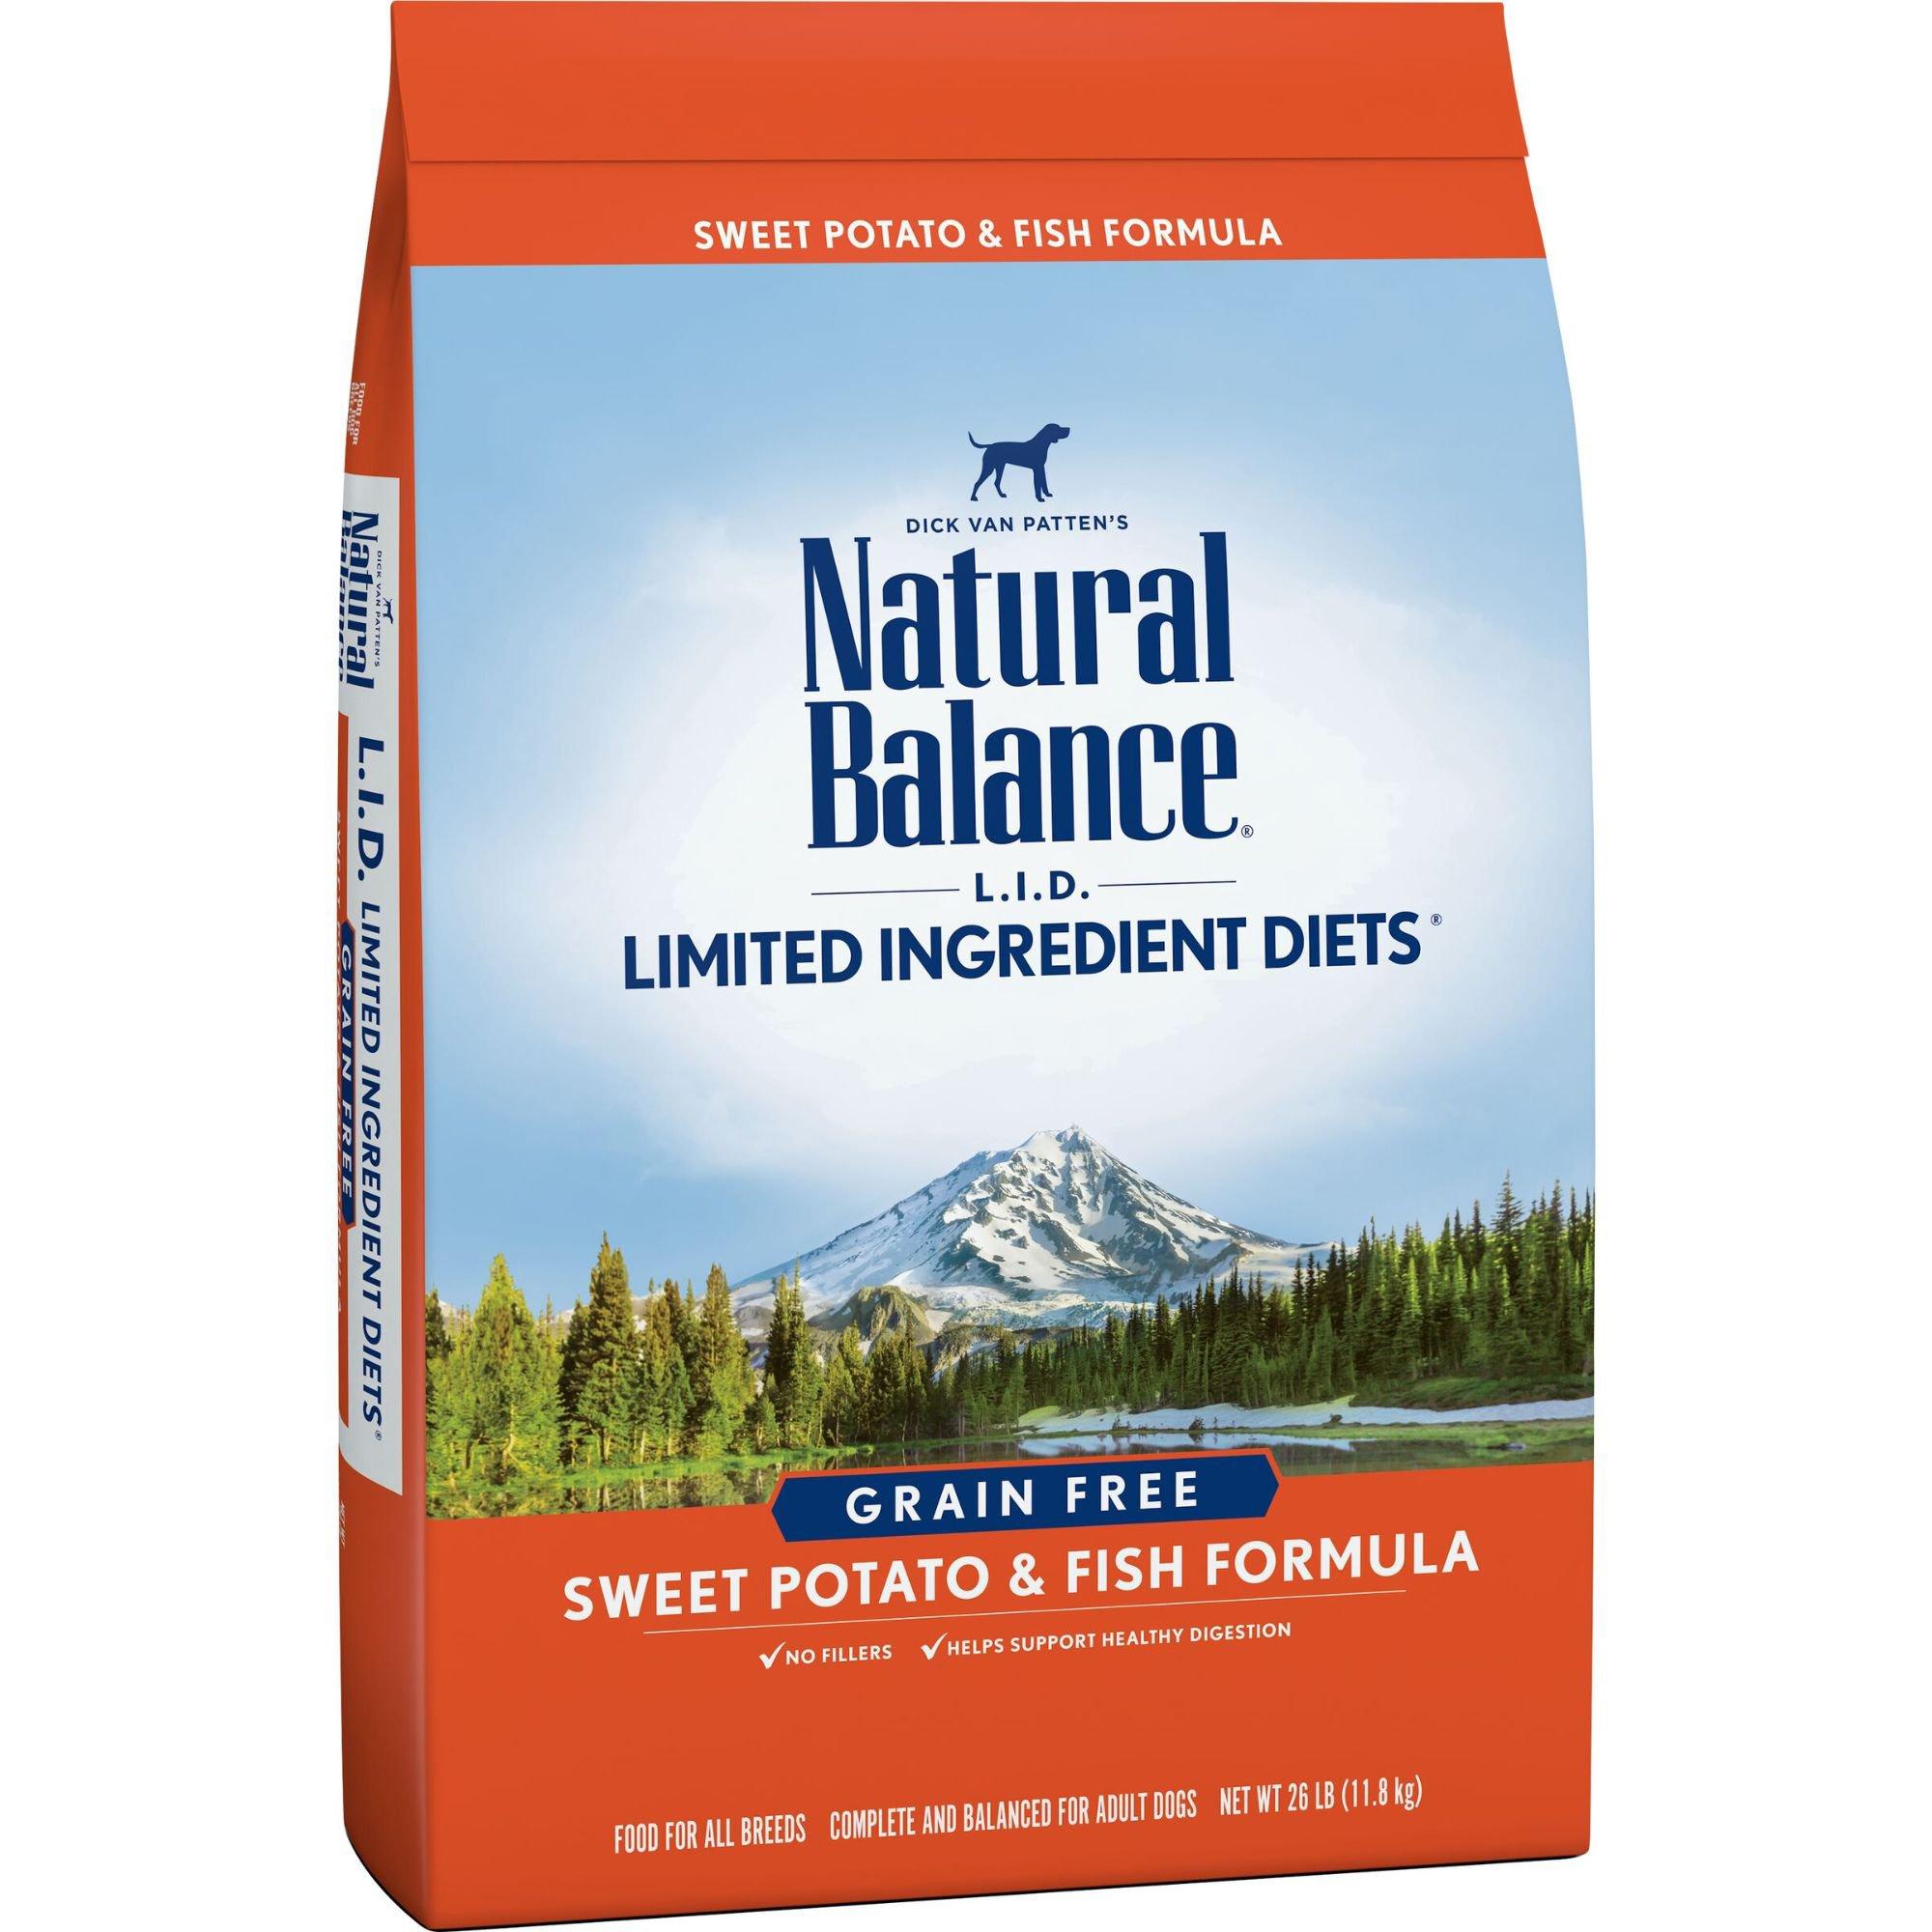 Natural Balance L.I.D. Limited Ingredient Diets Sweet Potato & Fish ...